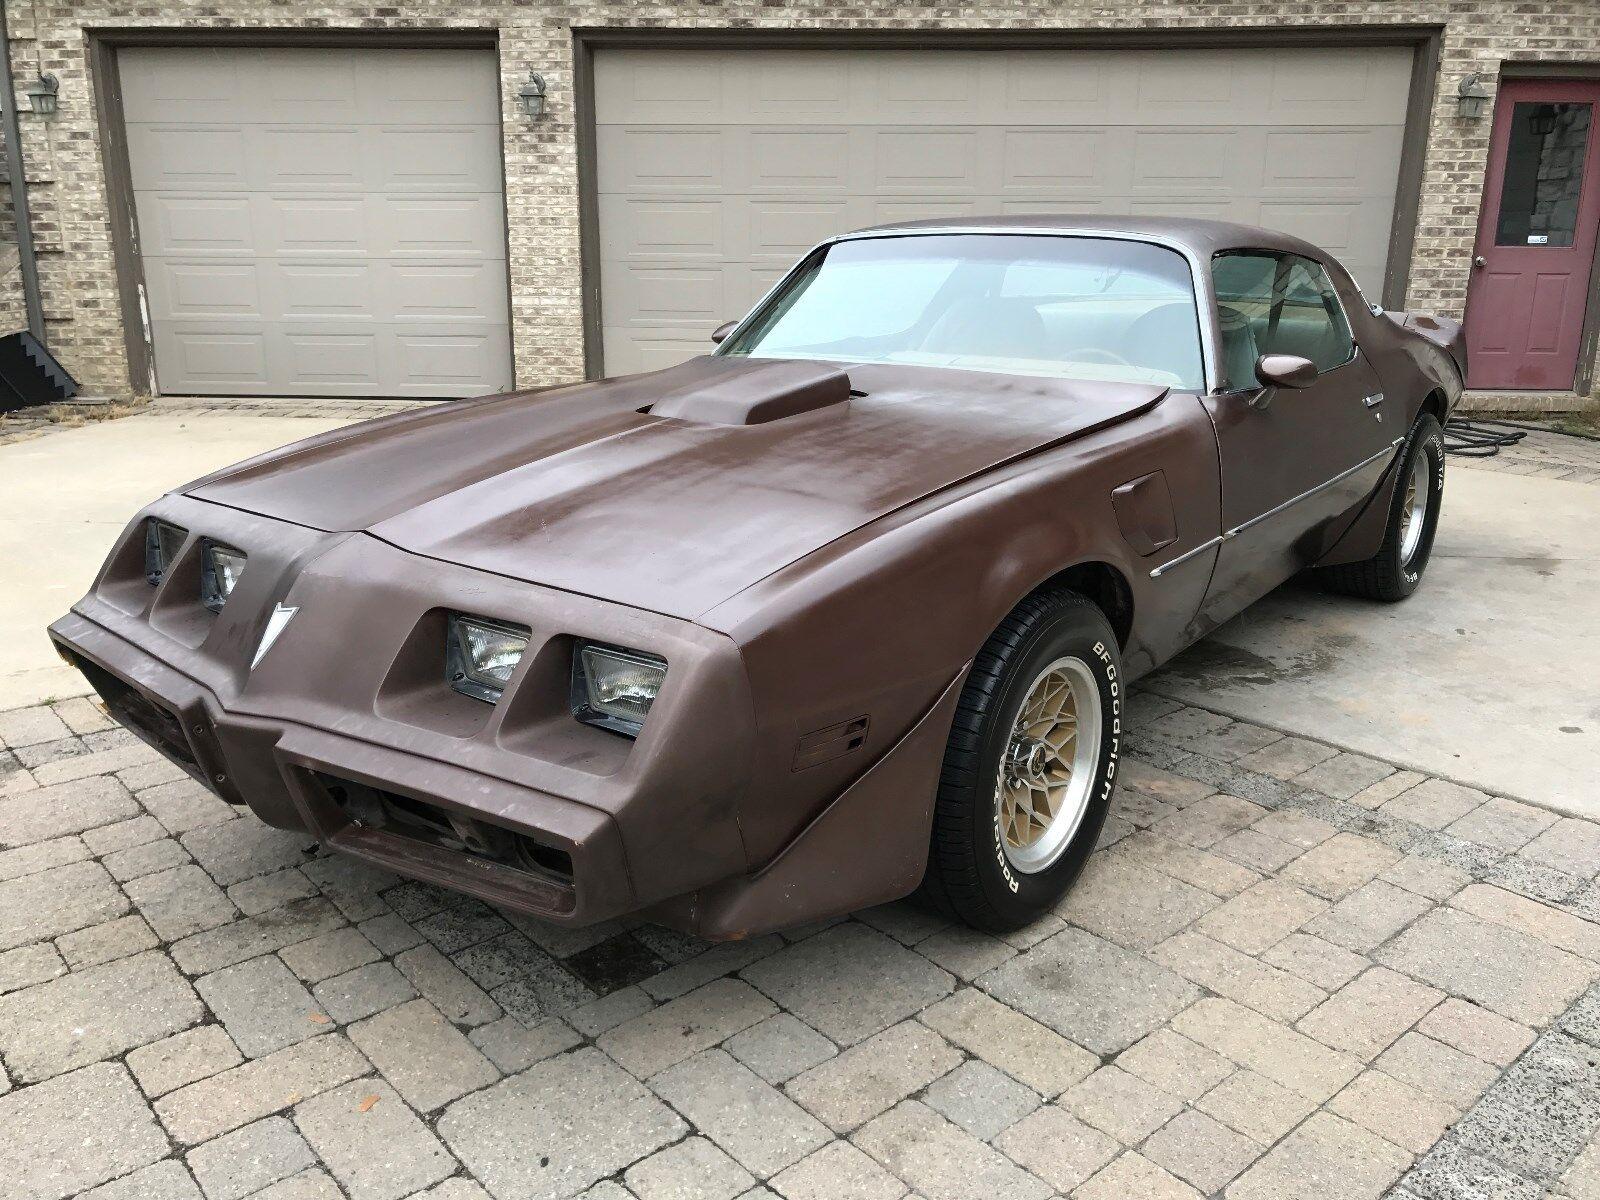 1979 Pontiac Trans Am : RUSTFREE 1979 TRANS AM PROJECT CAR. RUNS AND DRIVES